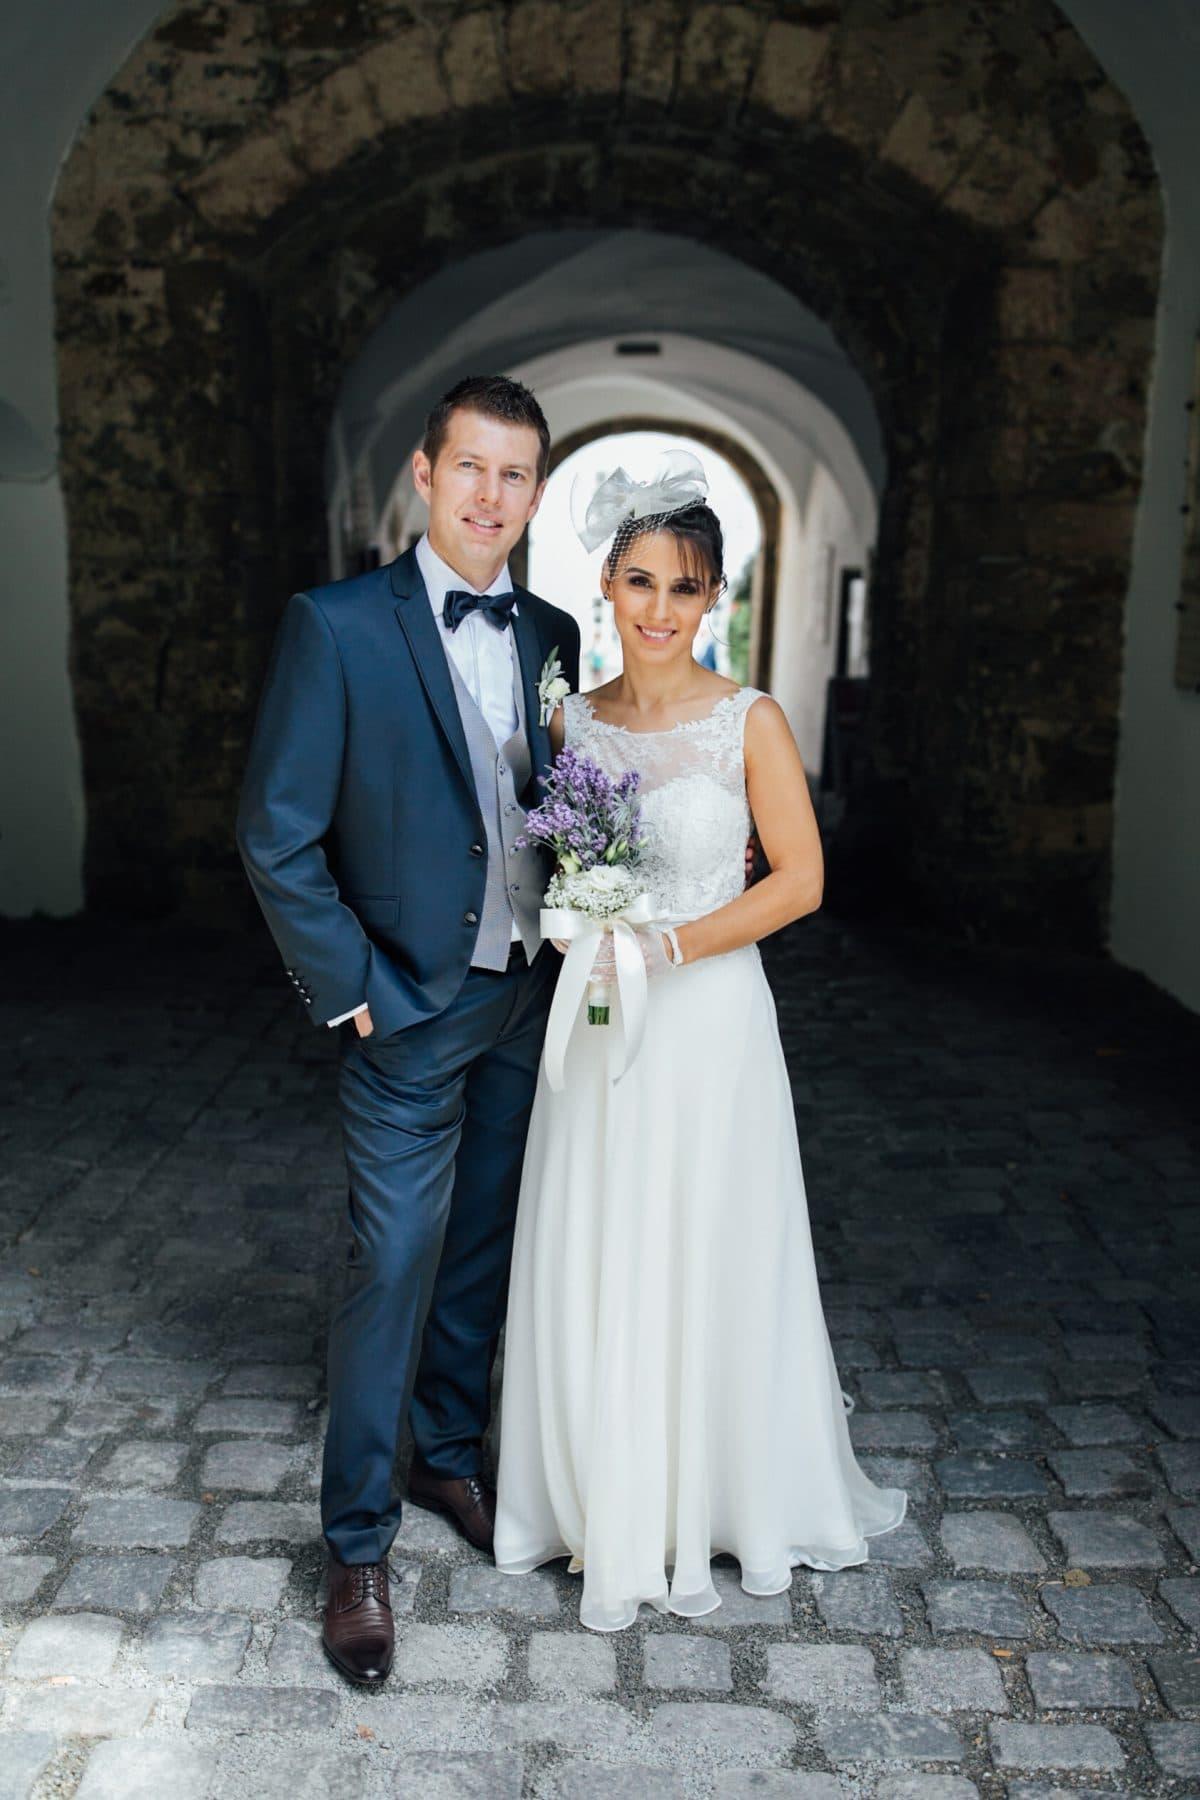 Elcin's Brautkleid nach Maß